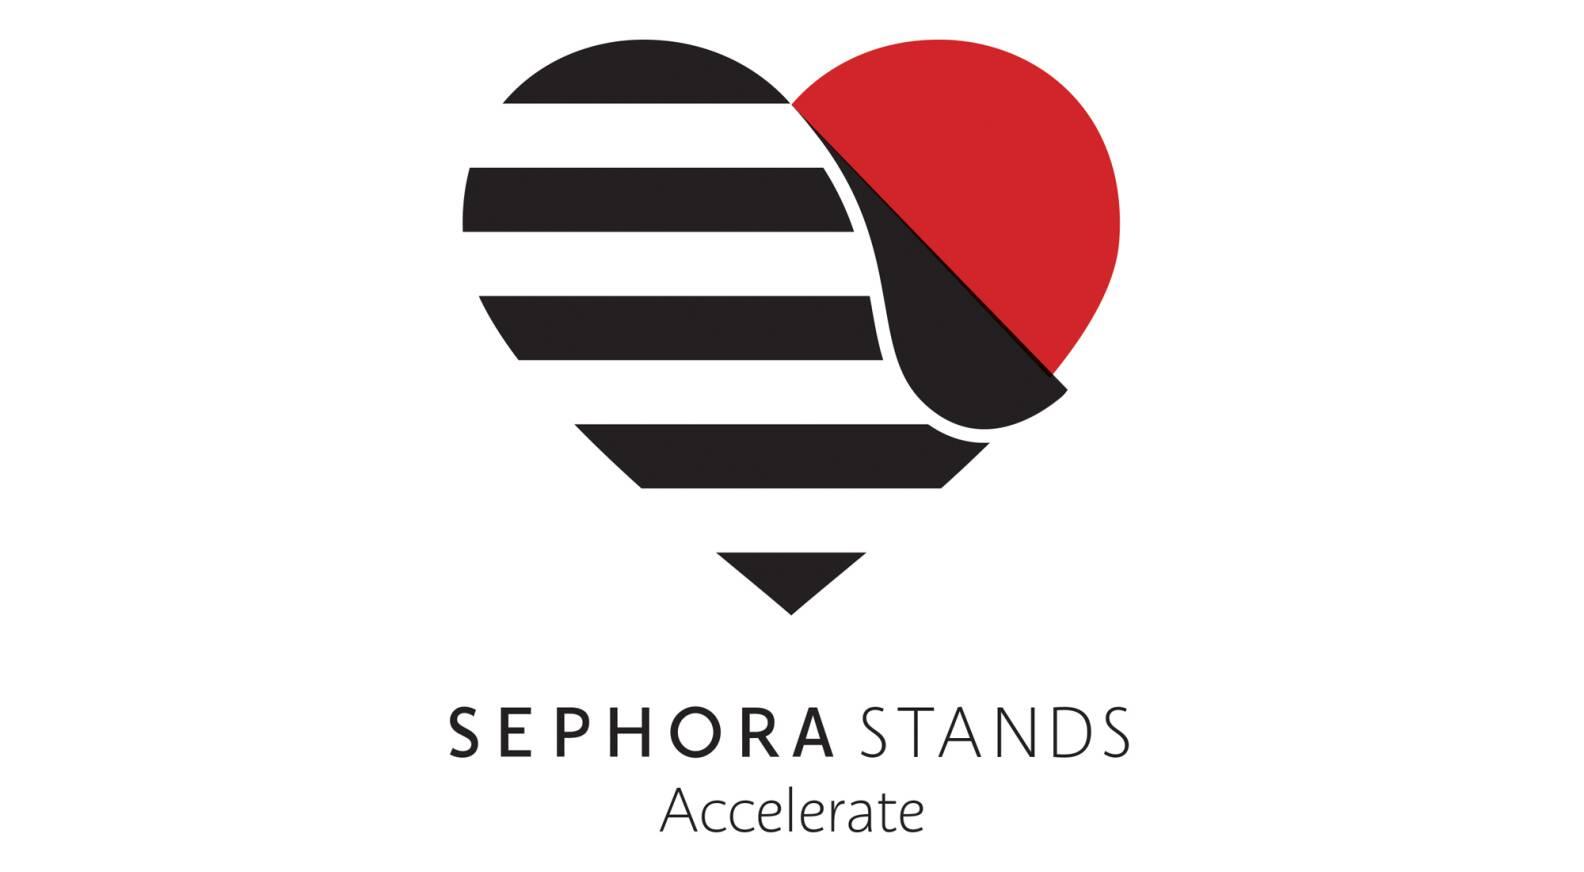 Sephora Accelerate: η Sephora προάγει την γυναικεία επιχειρηματικότητα! Δήλωσε συμμετοχή τώρα!